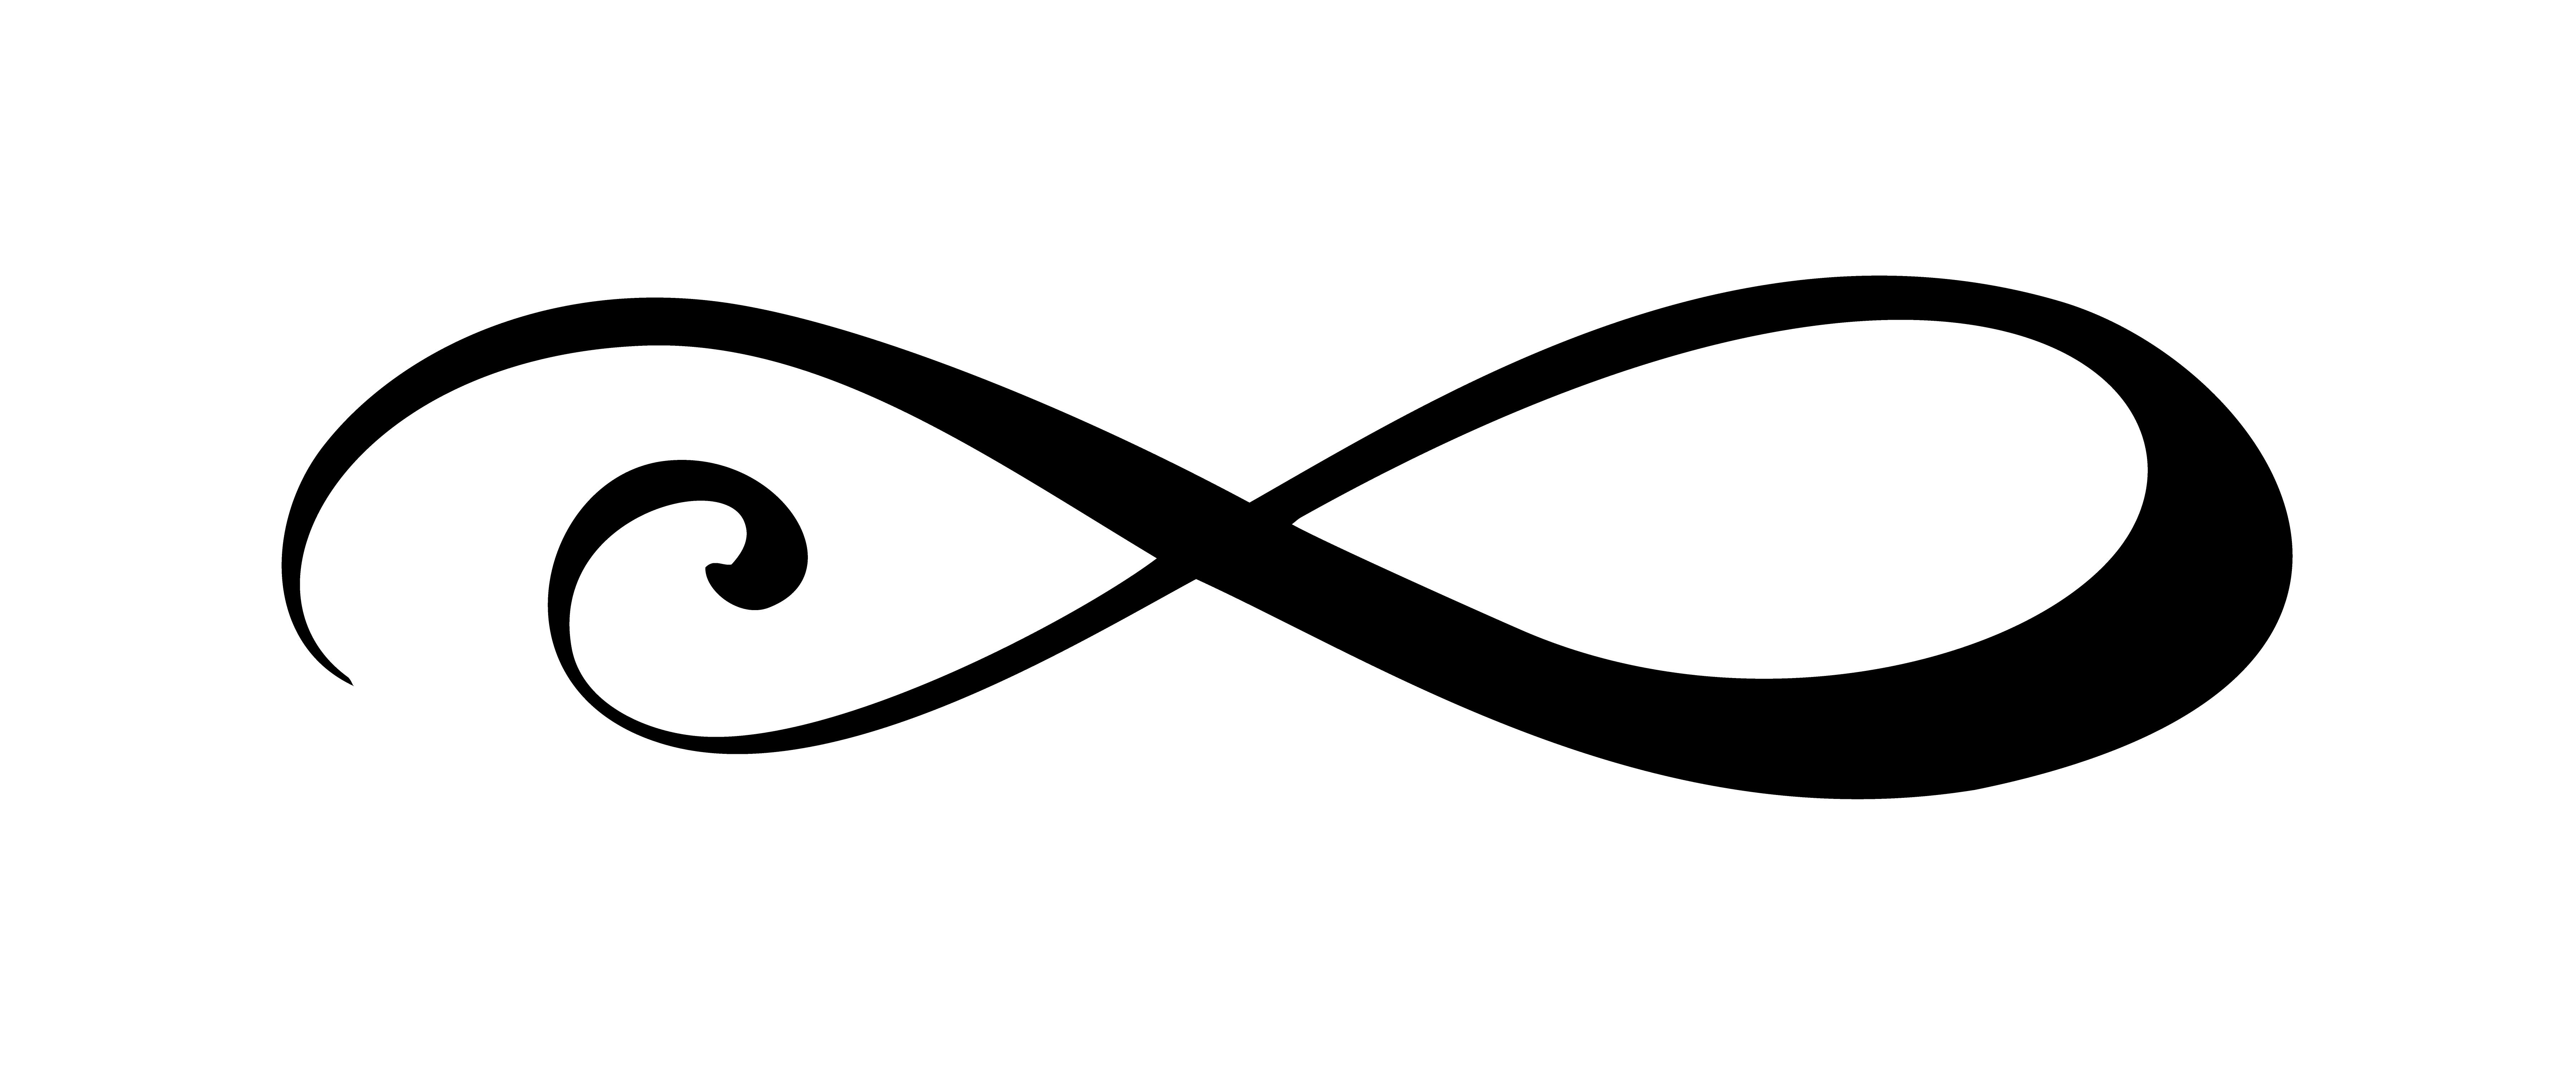 Infinity calligraphy vector illustration symbol. Eternal ...